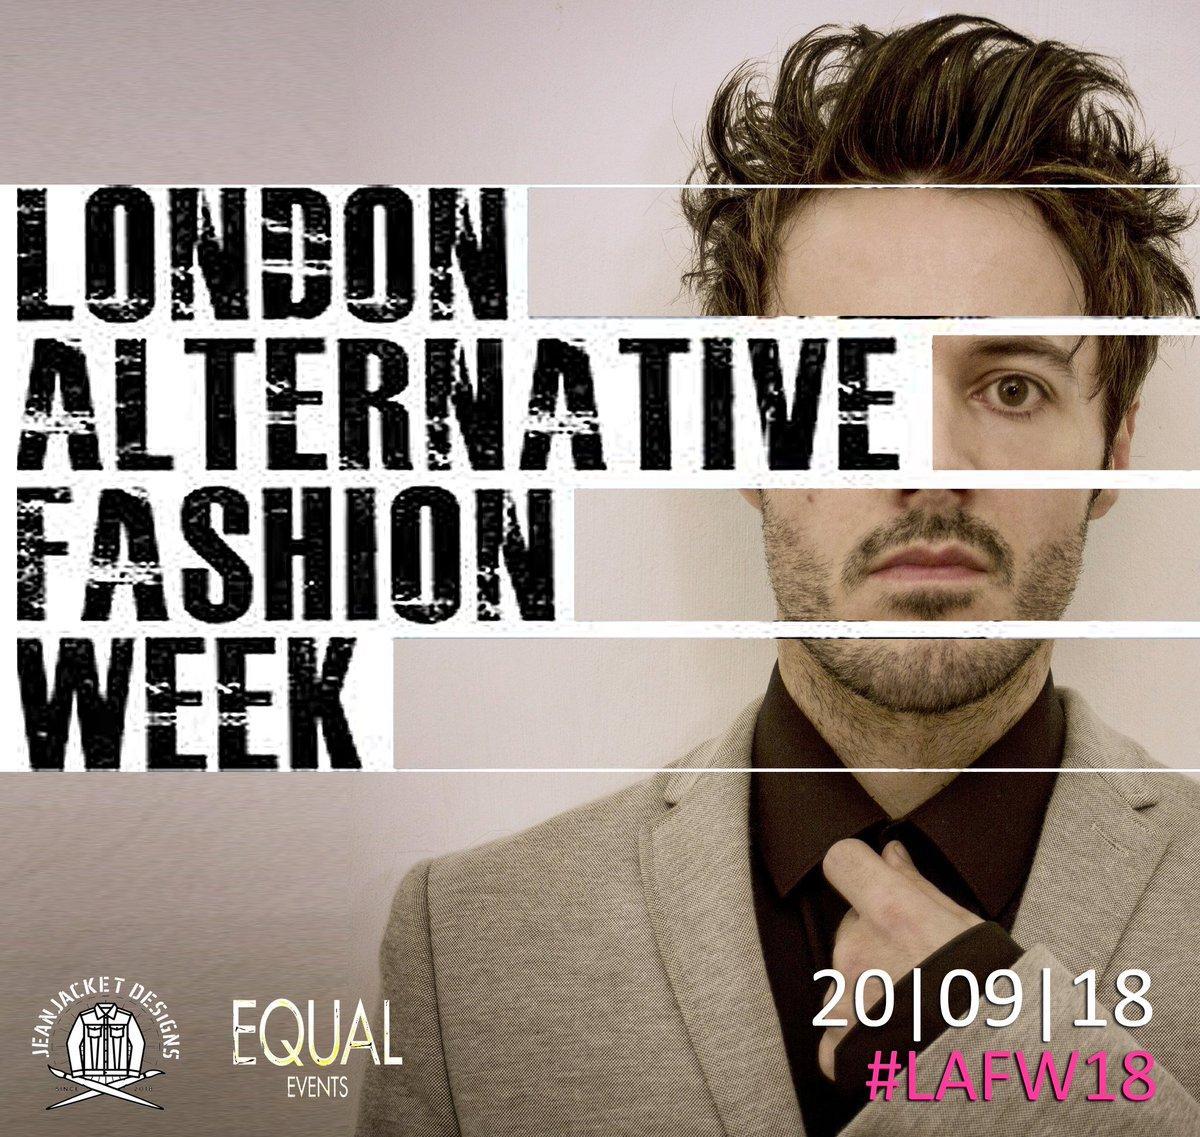 test Twitter Media - Excited to be playing London Alternative Fashion Week tomorrow!! 🔥🤟x  #London #alternative #fashion #LAFW18 #jeanjacketdesigns @no1vintagegirl #alternativearts #equalevents #londonfashionweek #fashionweek https://t.co/eq7R753fGE